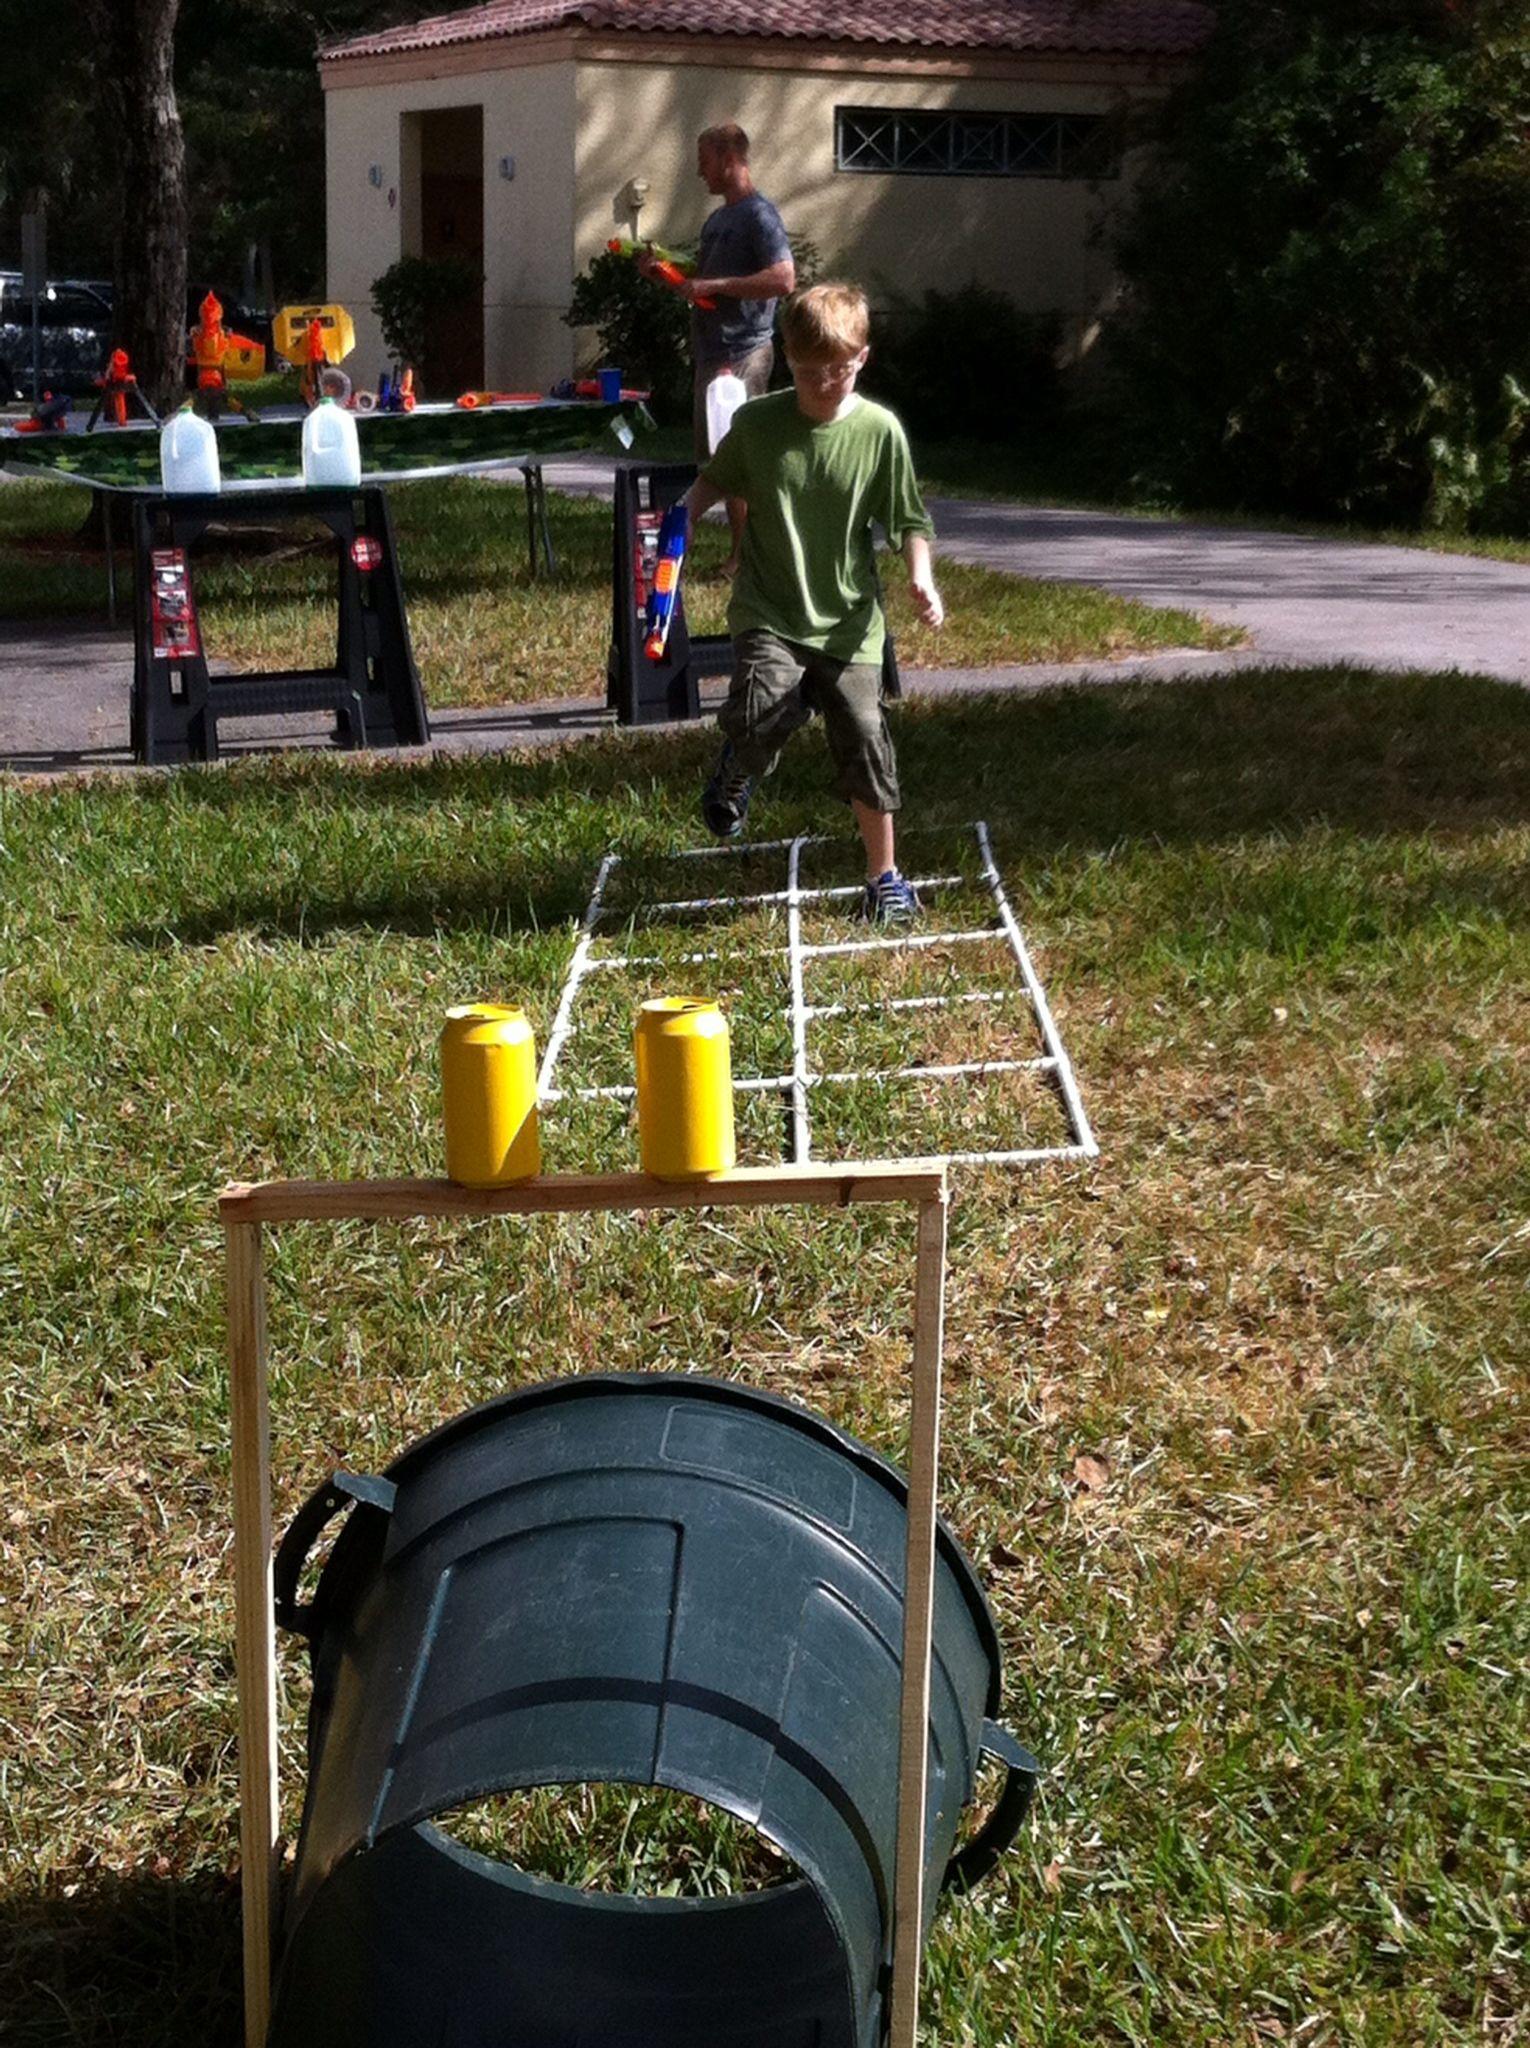 Pin On Nerf Wars Nerf Gun Birthday Party Backyard diy nerf war course